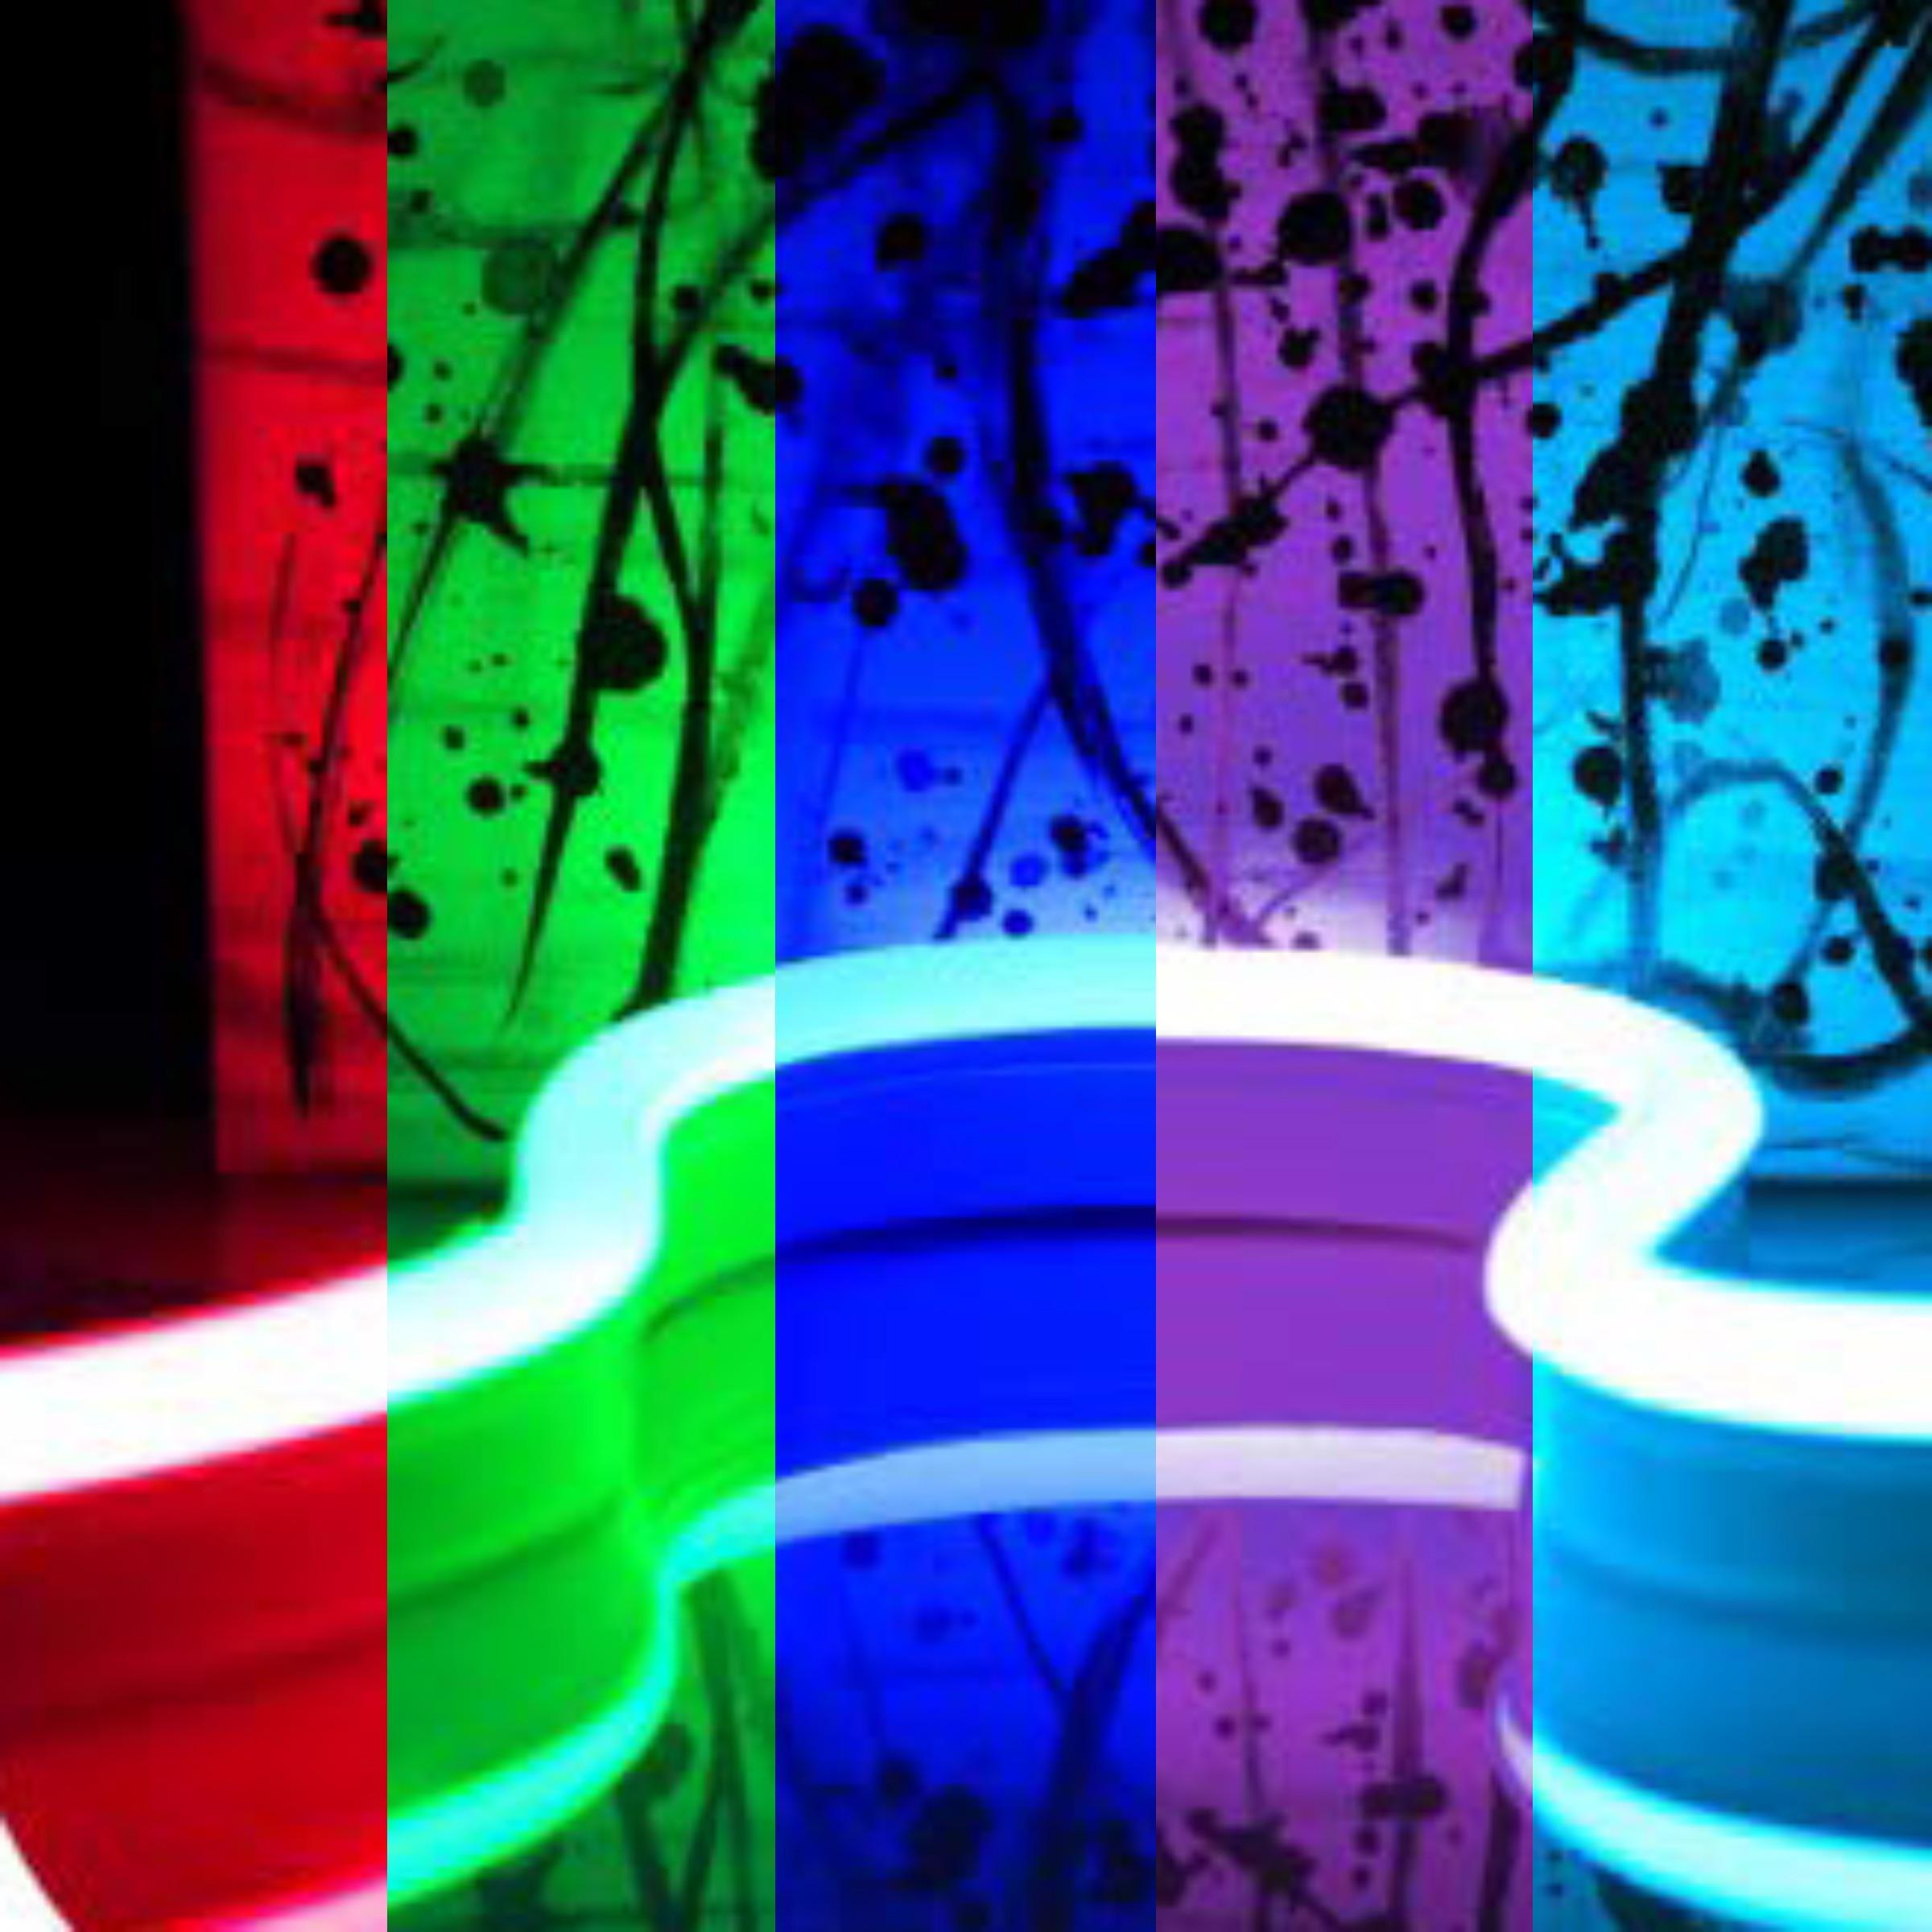 Led Neon Flex RGB Pixel 24V F21-HB - Interlite